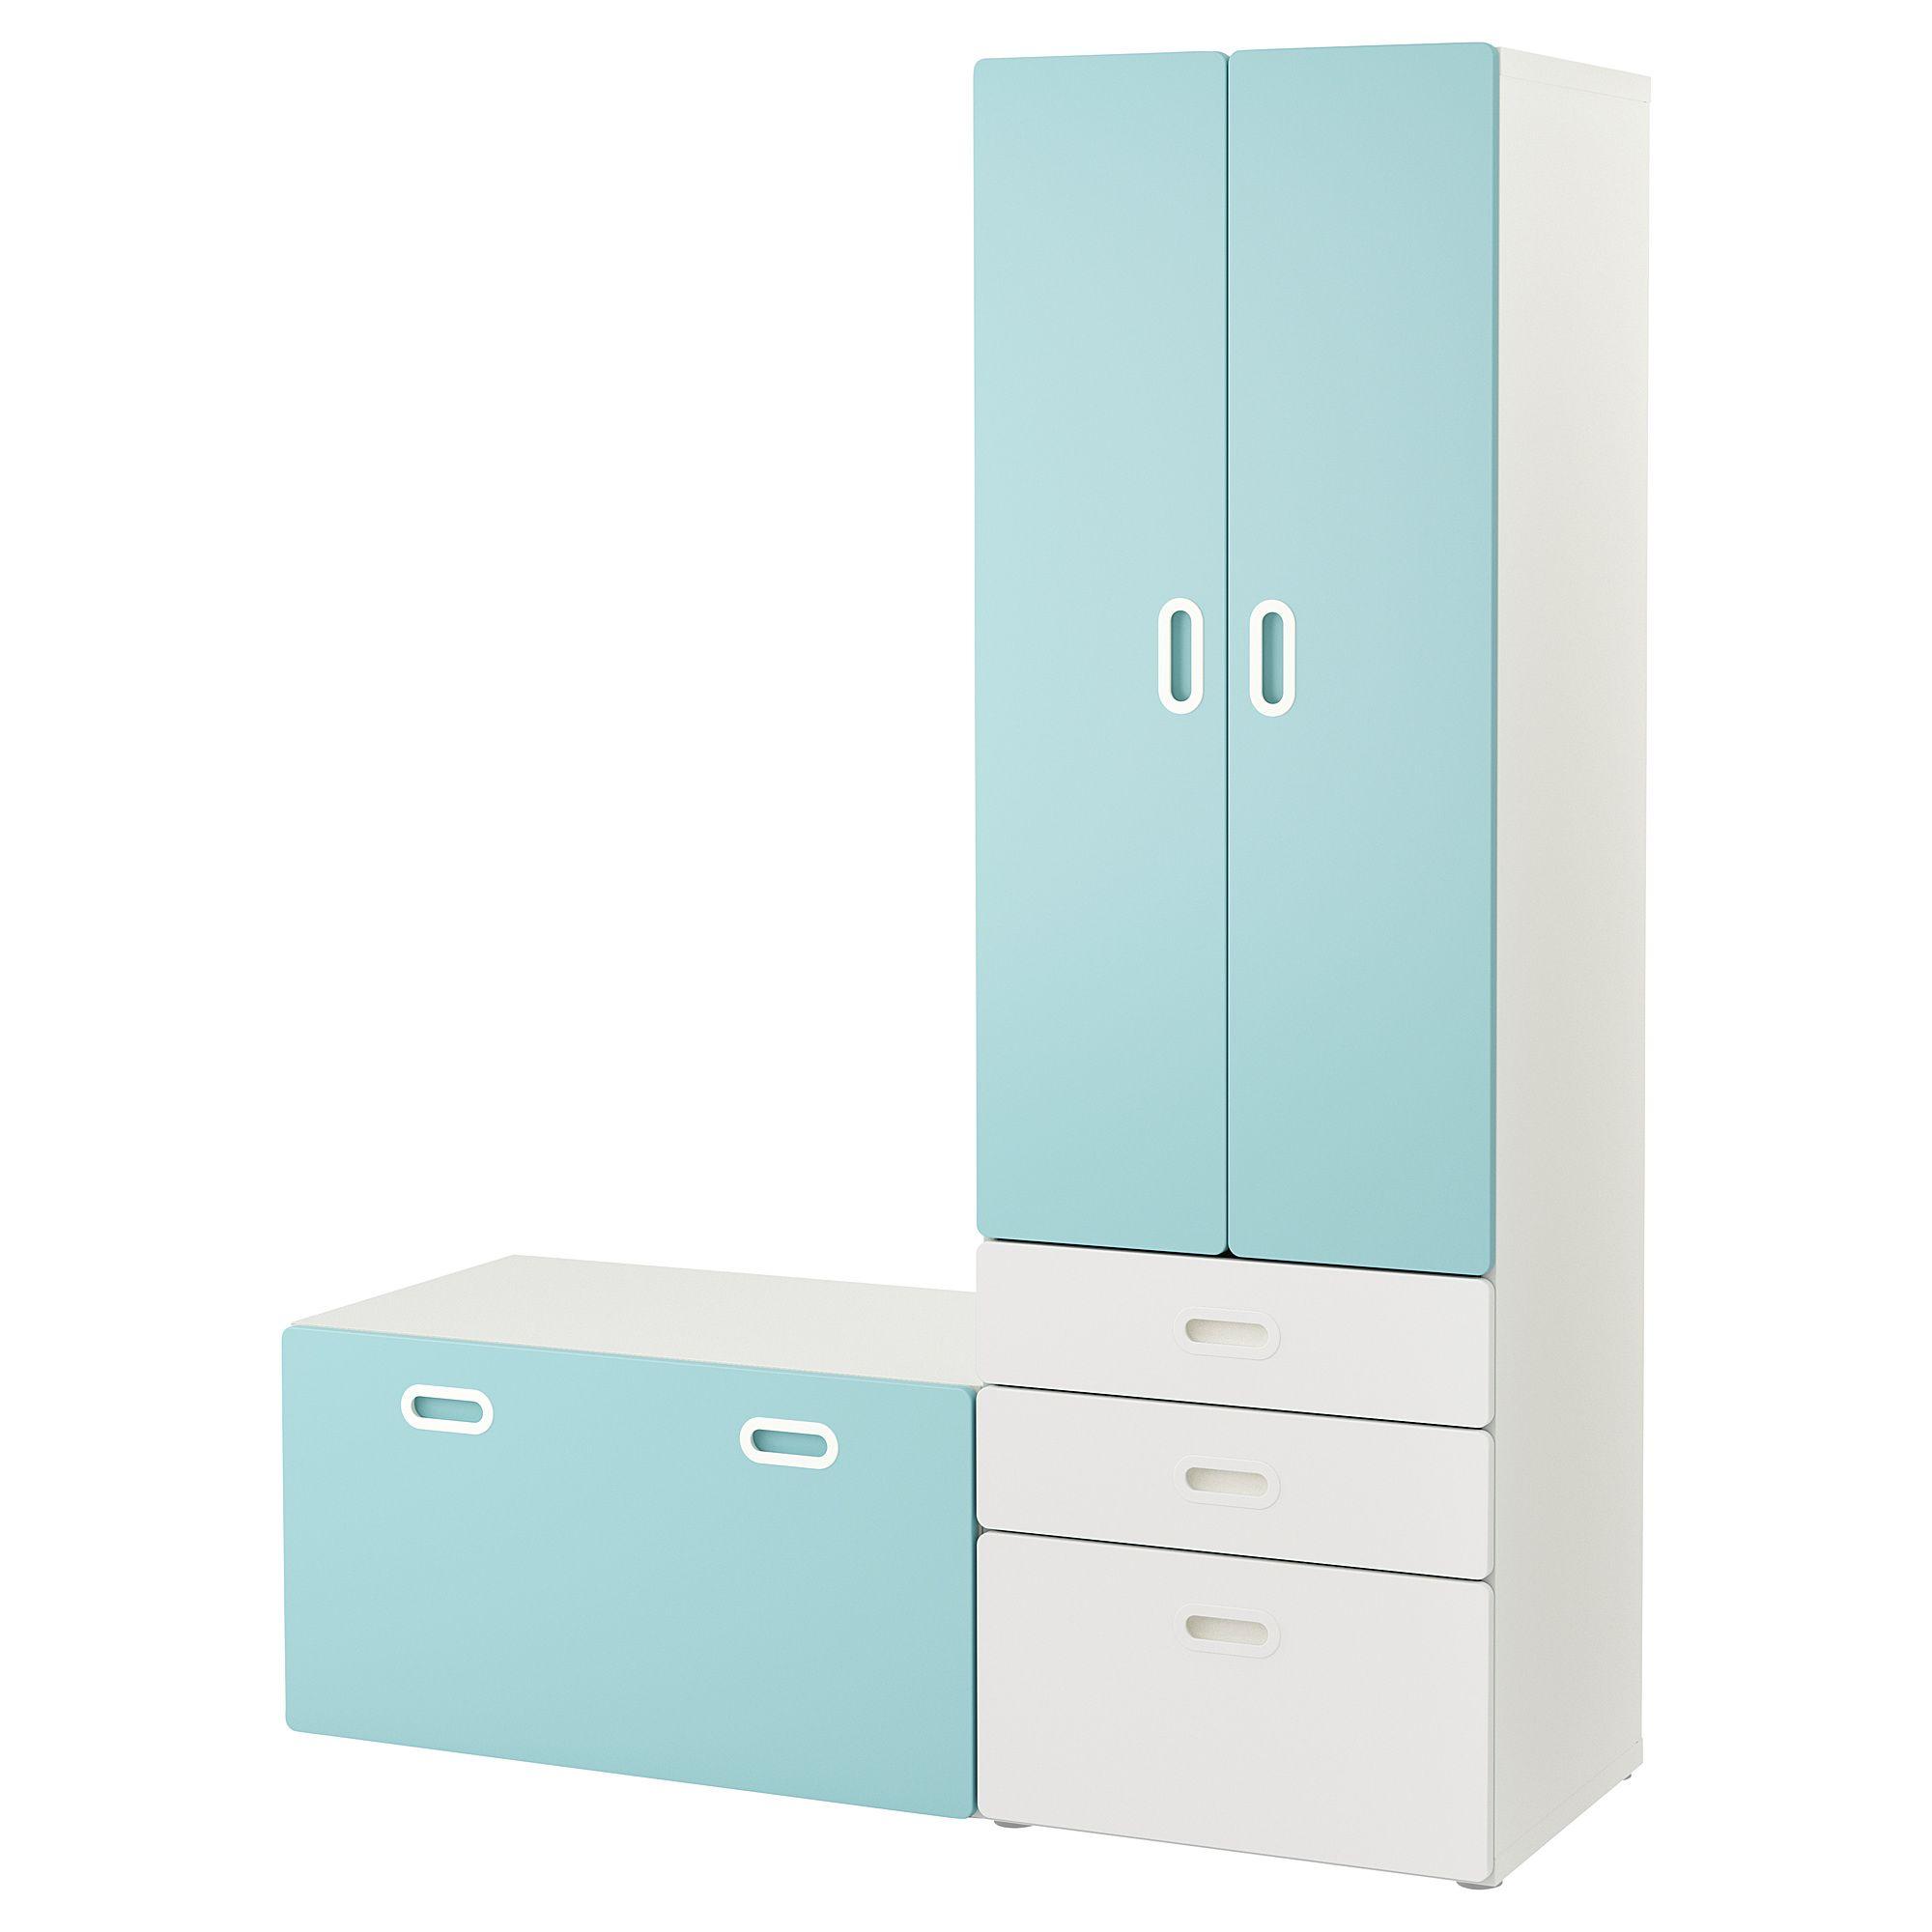 STUVA / FRITIDS Wardrobe with storage bench white, light